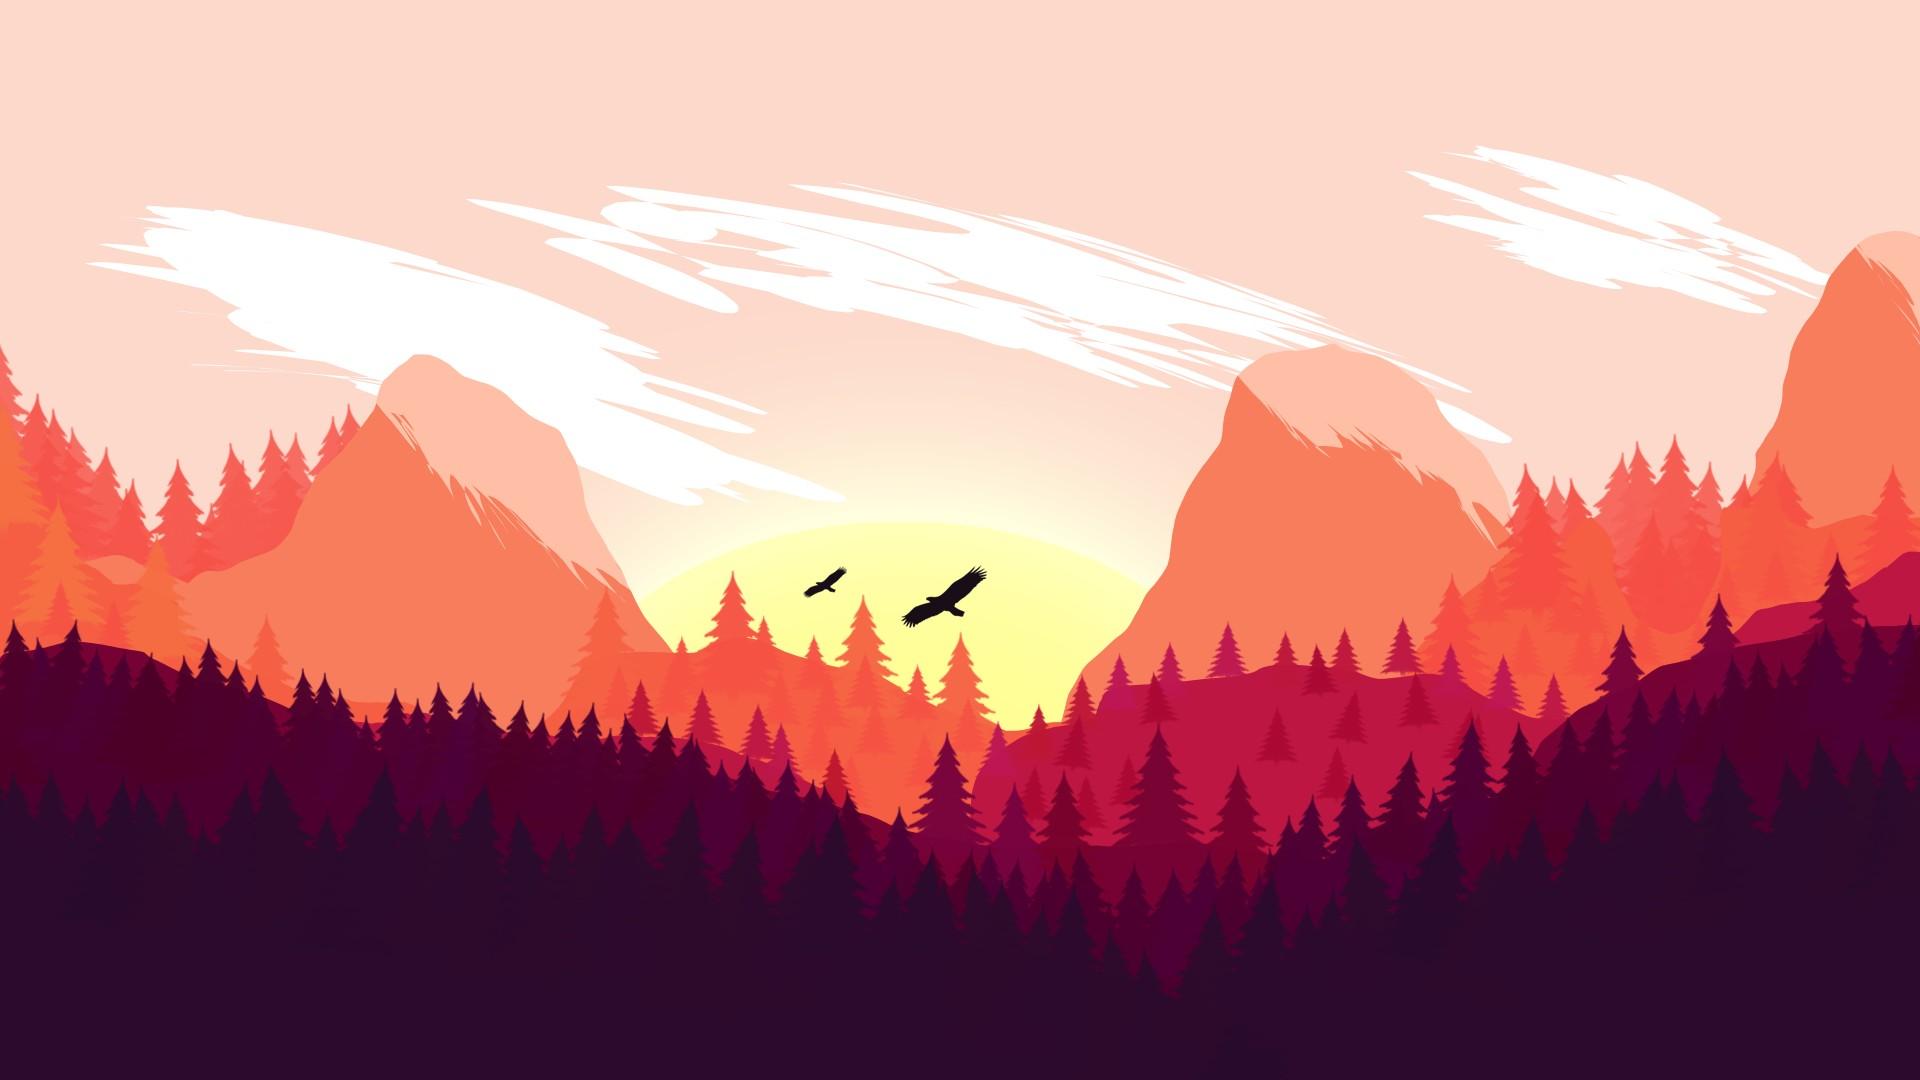 Recovery Mountain Minimalist 4k Hd Desktop Wallpaper For: Freedom Glider, Minimalism, Mountain Pass, Landscape